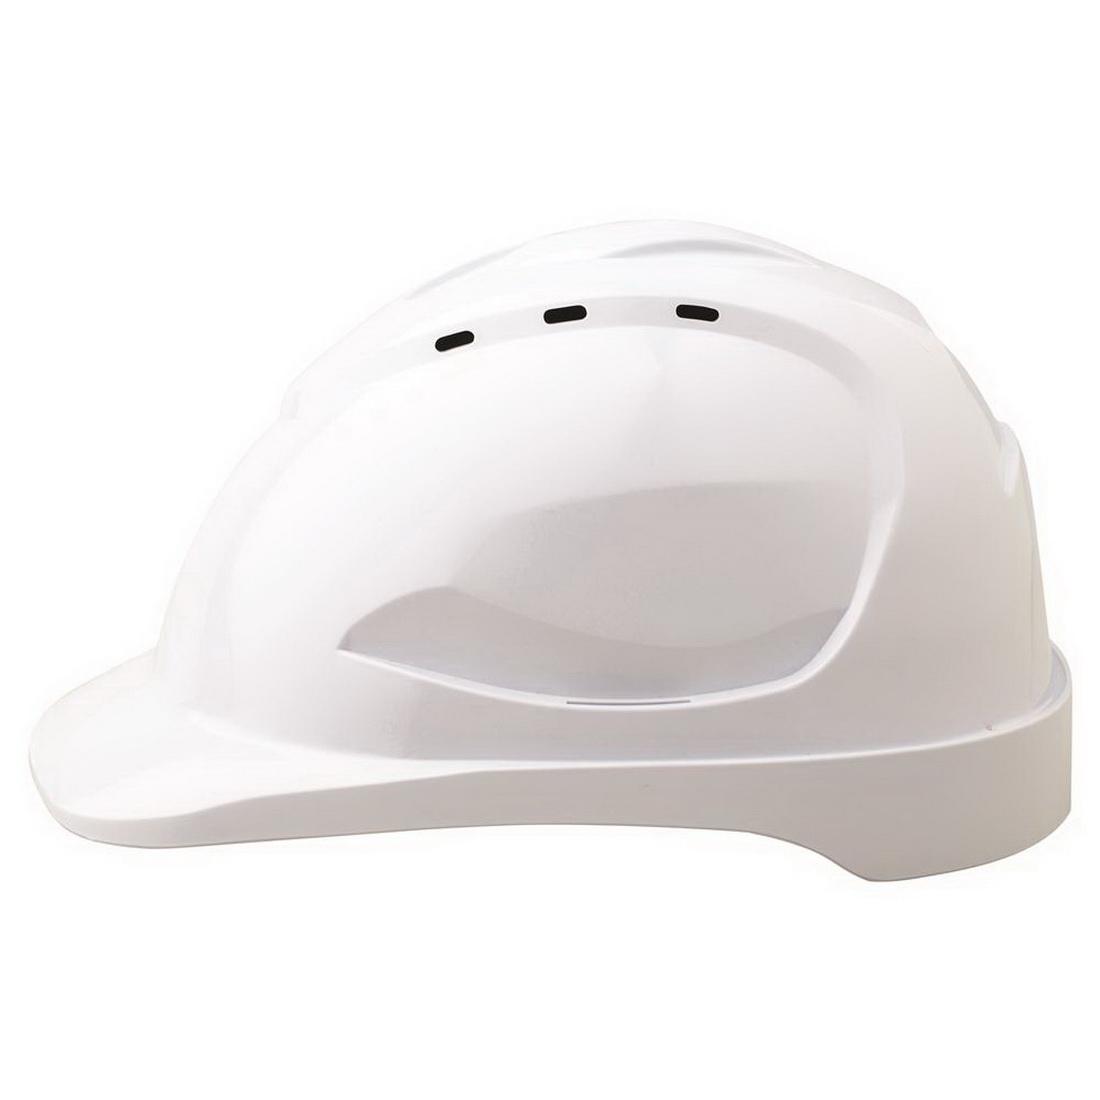 V9 Hard Hat Vented Pushlock Harness Fluro Yellow